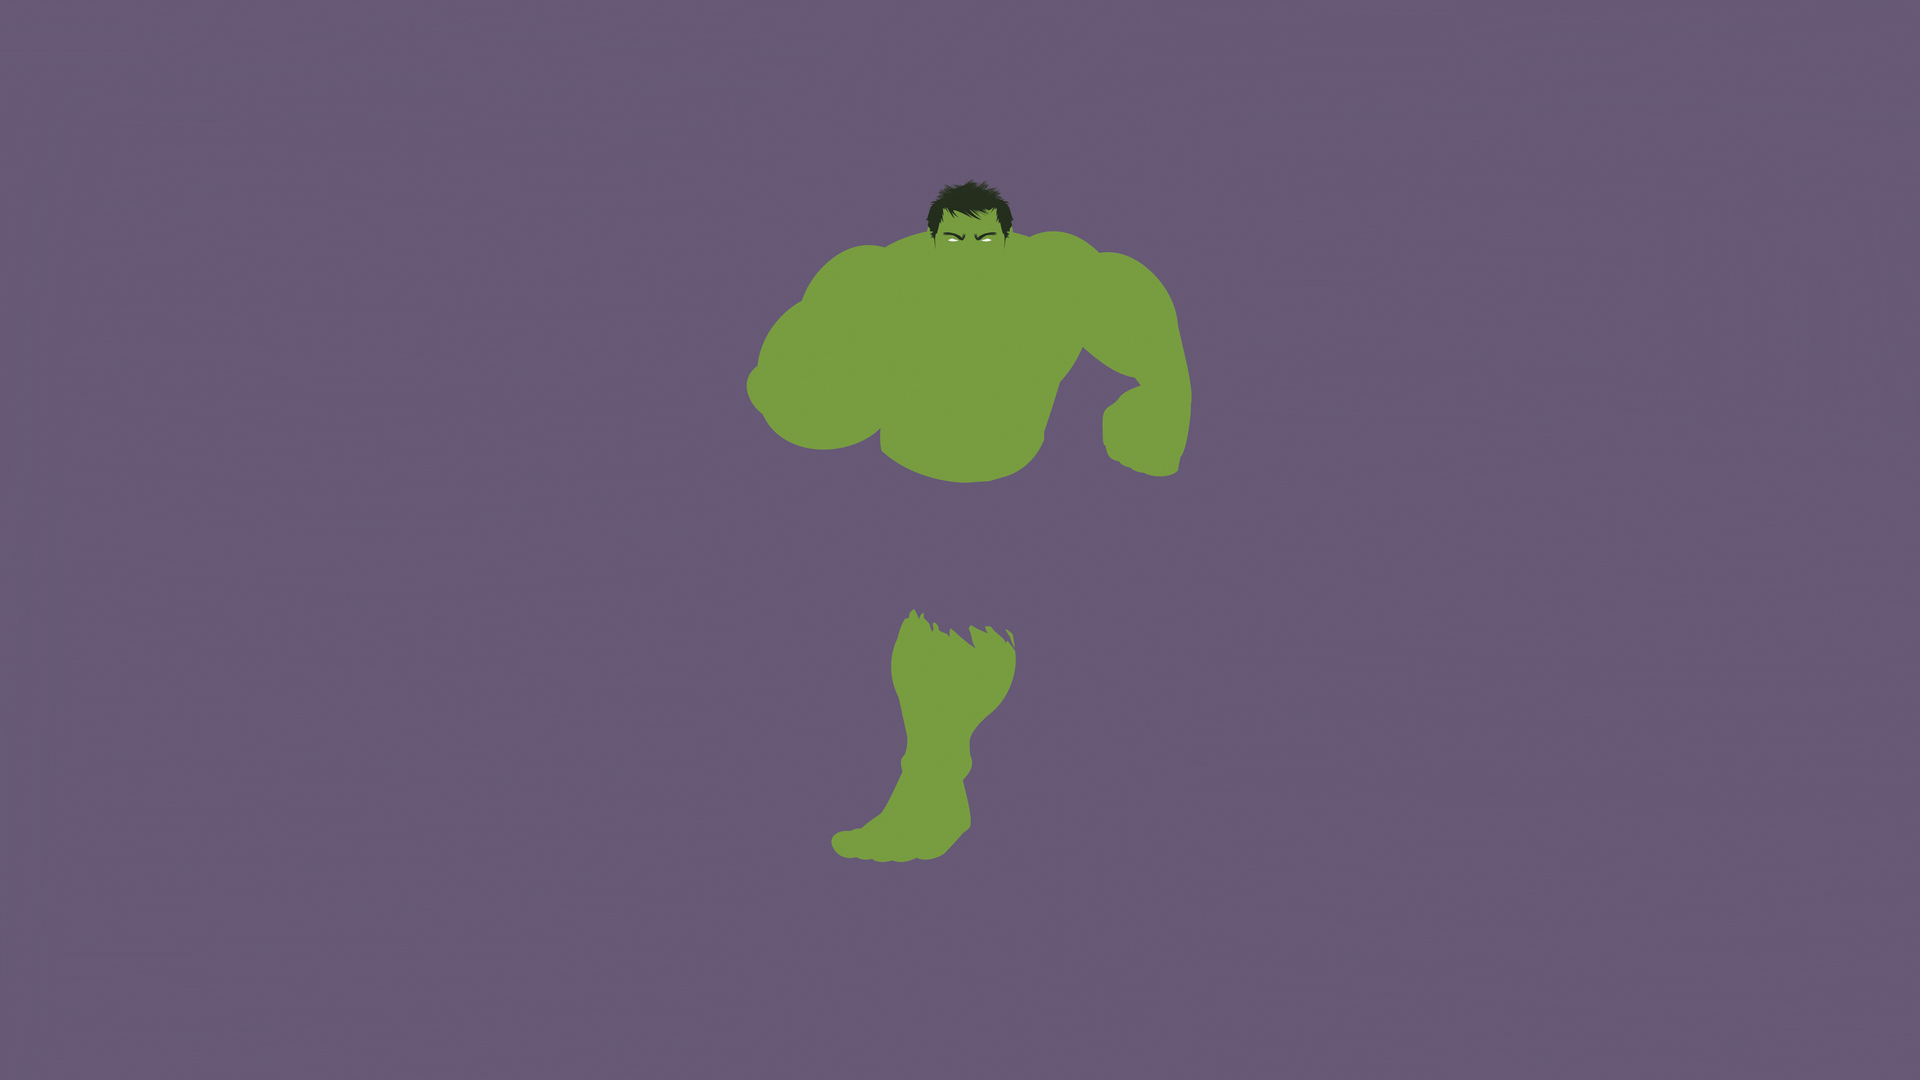 Gravity Falls Landscapes Wallpaper The Hulk Minimalist Purple The Jester S Corner